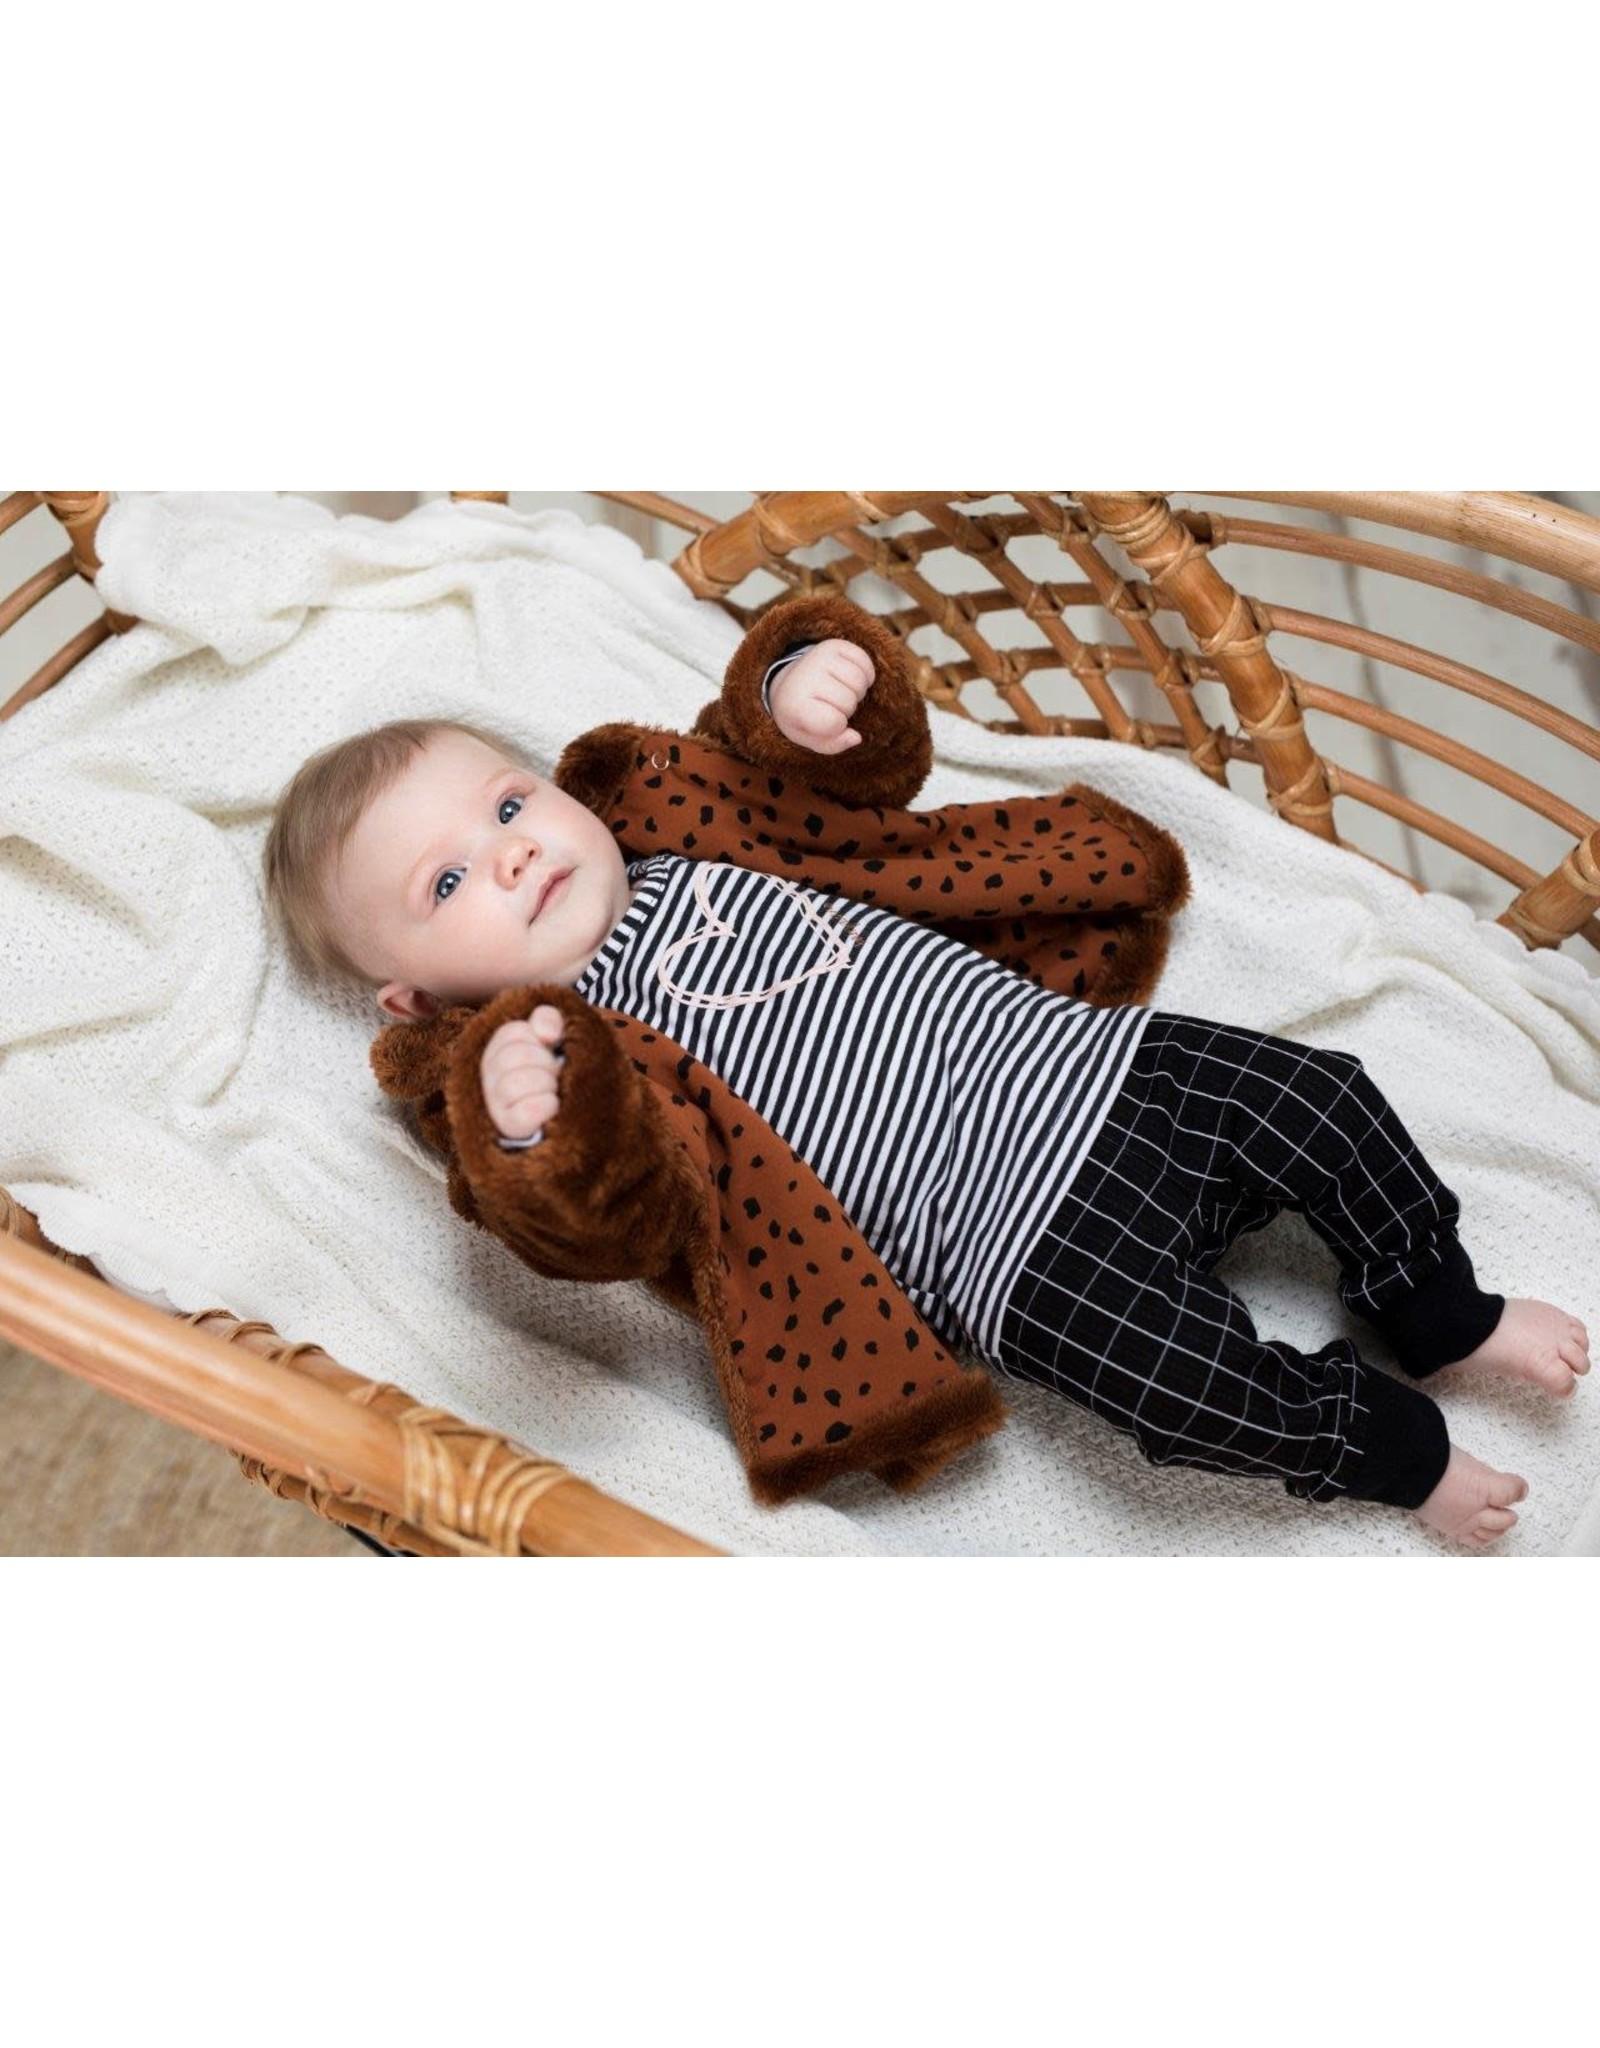 Bampidano Bampidano baby meisjes teddy vest Charlotte DALMATIAN Mocha